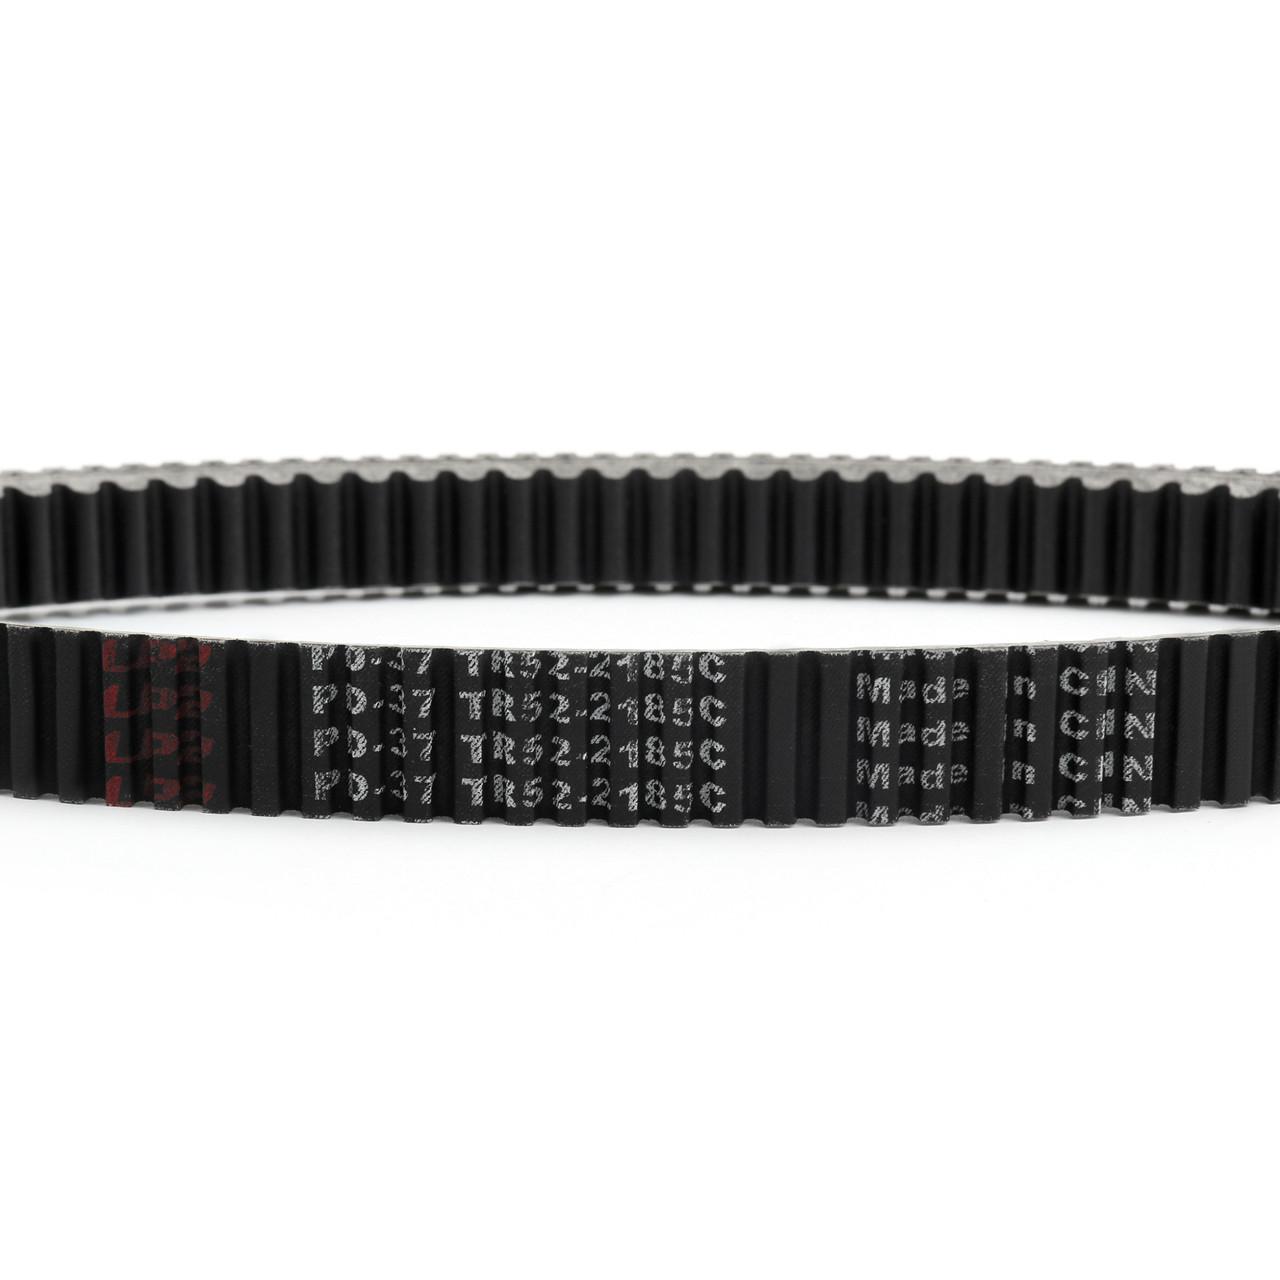 ATV Drive Belt UTV Belt Hisun 800 HS800 UTV 800 Bennche QLINK